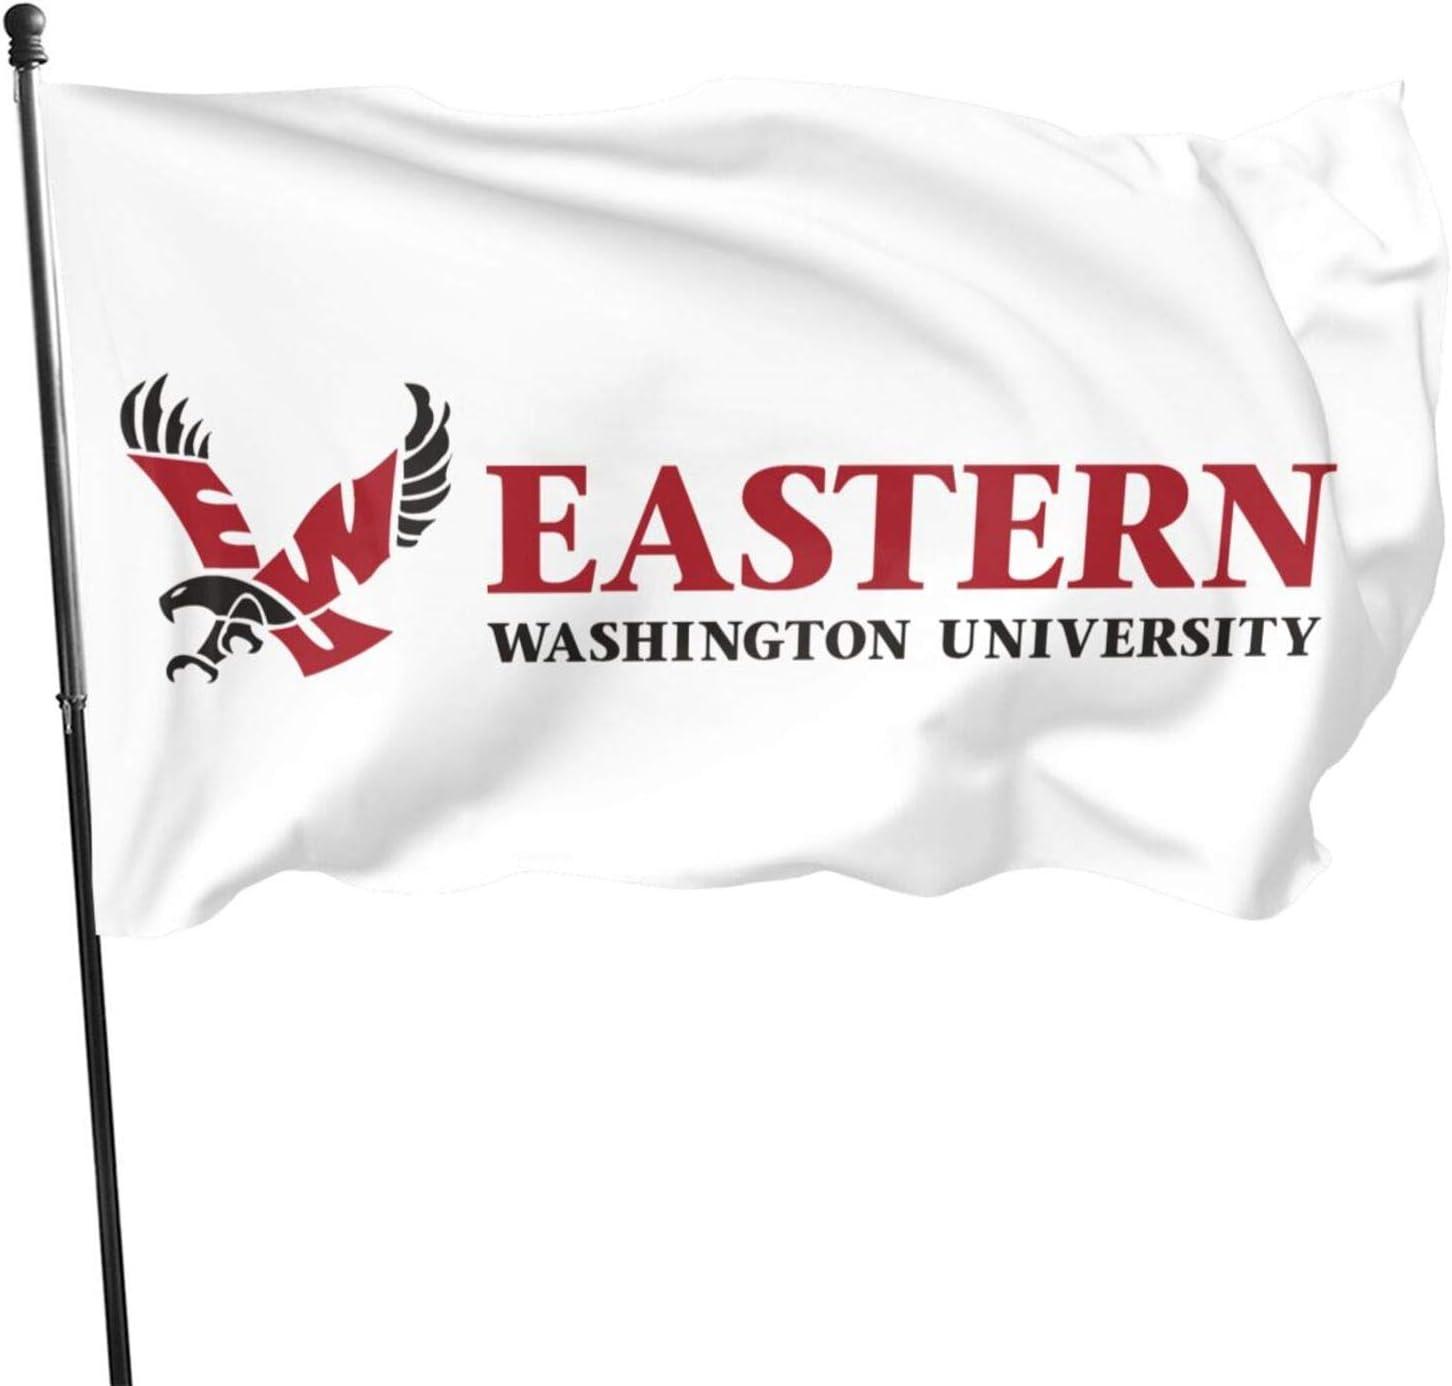 Ali Yee Eastern Washington University Logo Flag 3x5 Outdoor Indoor Banner Flag House Garden Decoration Sign